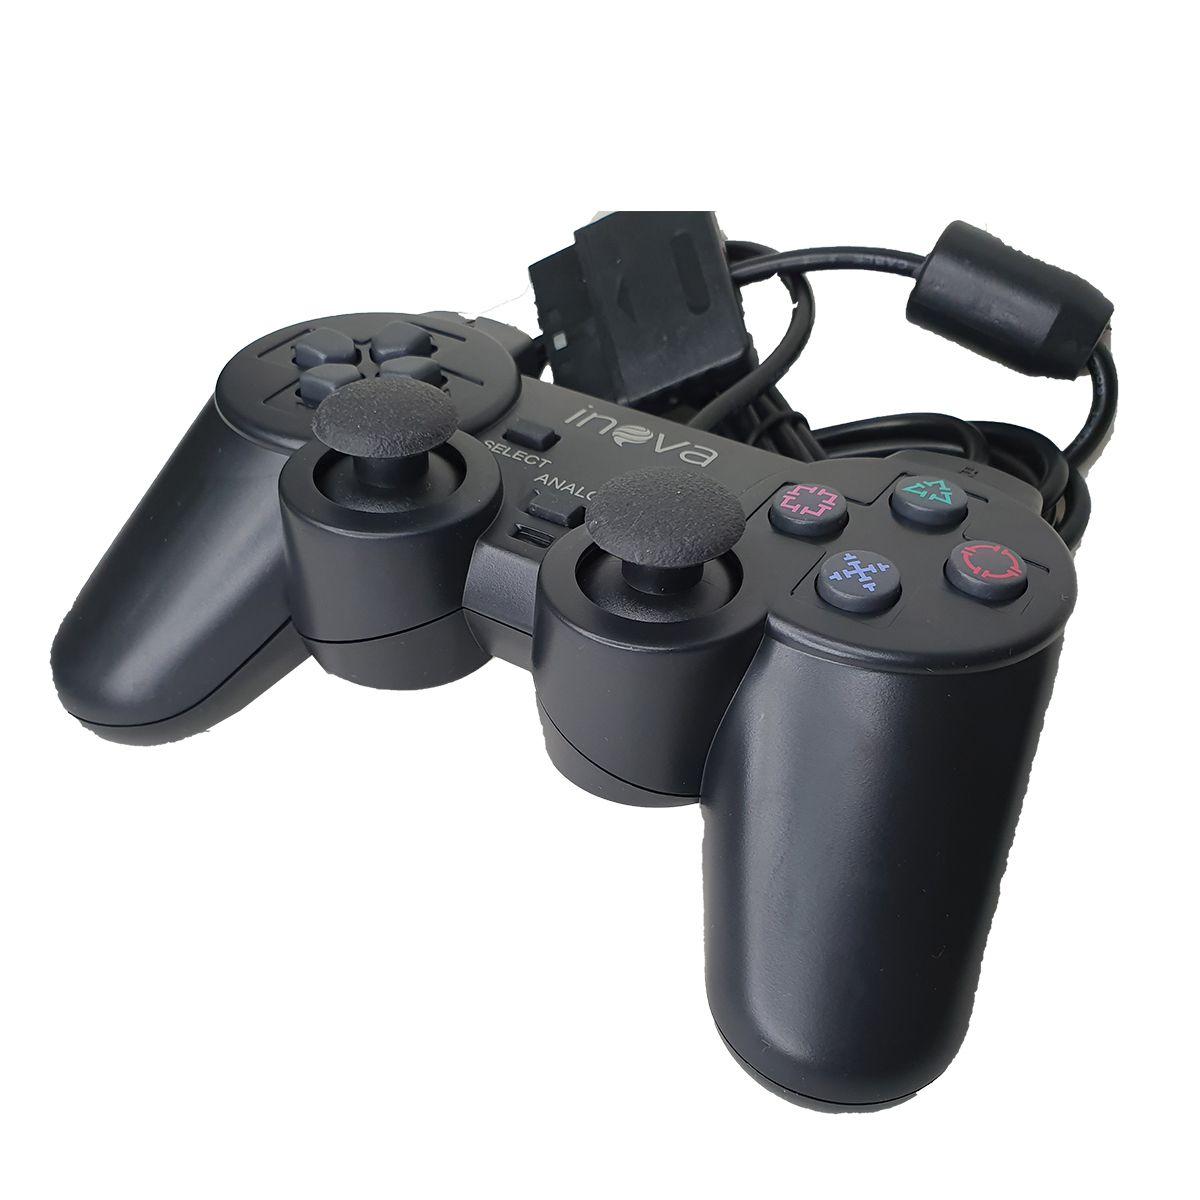 Controle JoyStick Play Dual Schok CON-8302 Inova